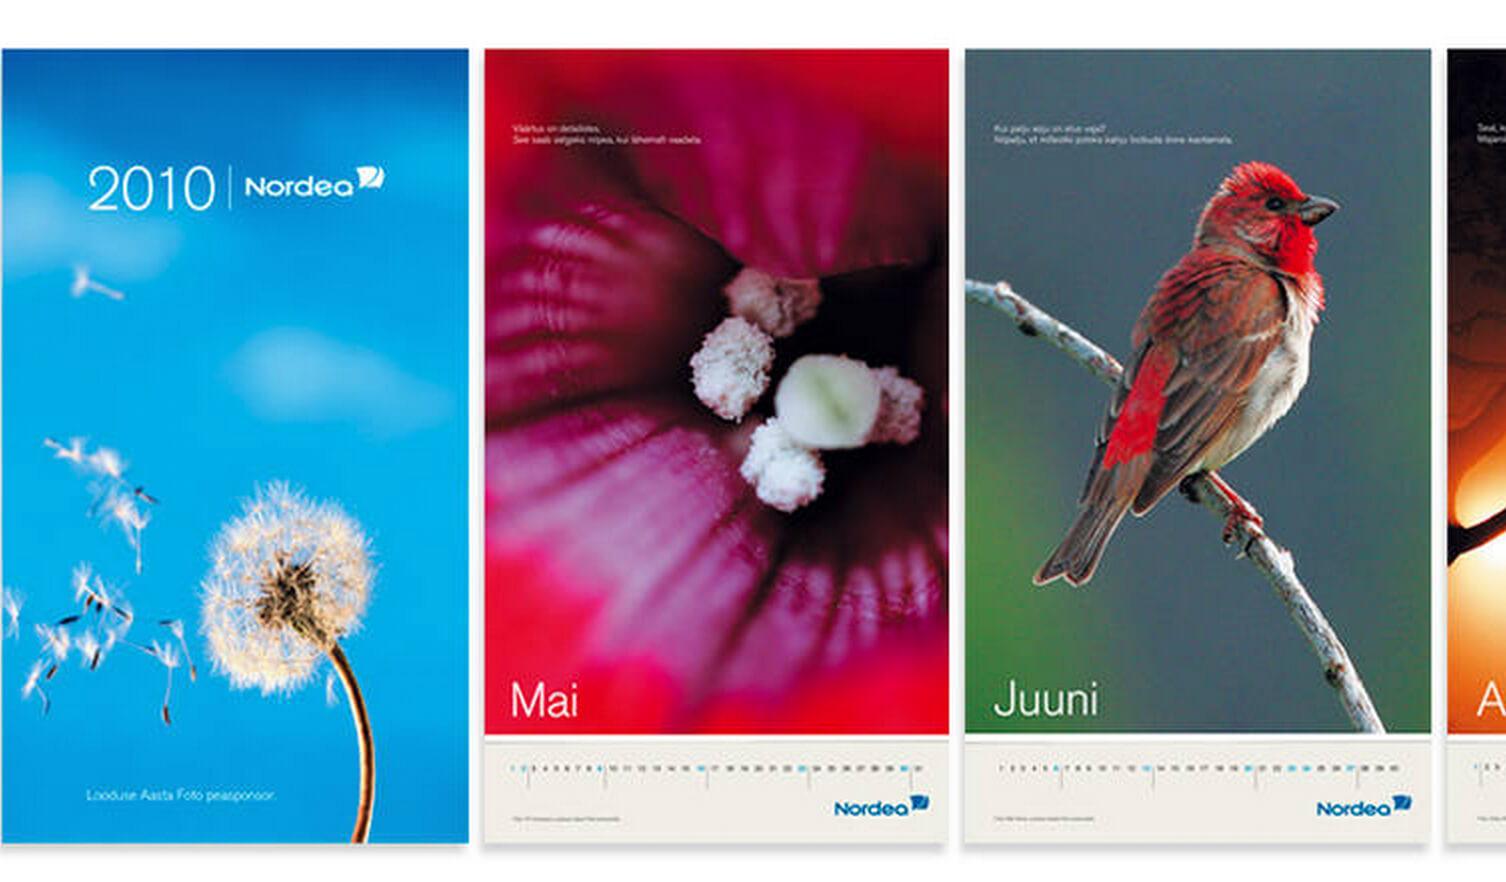 nordea-kalender-2010